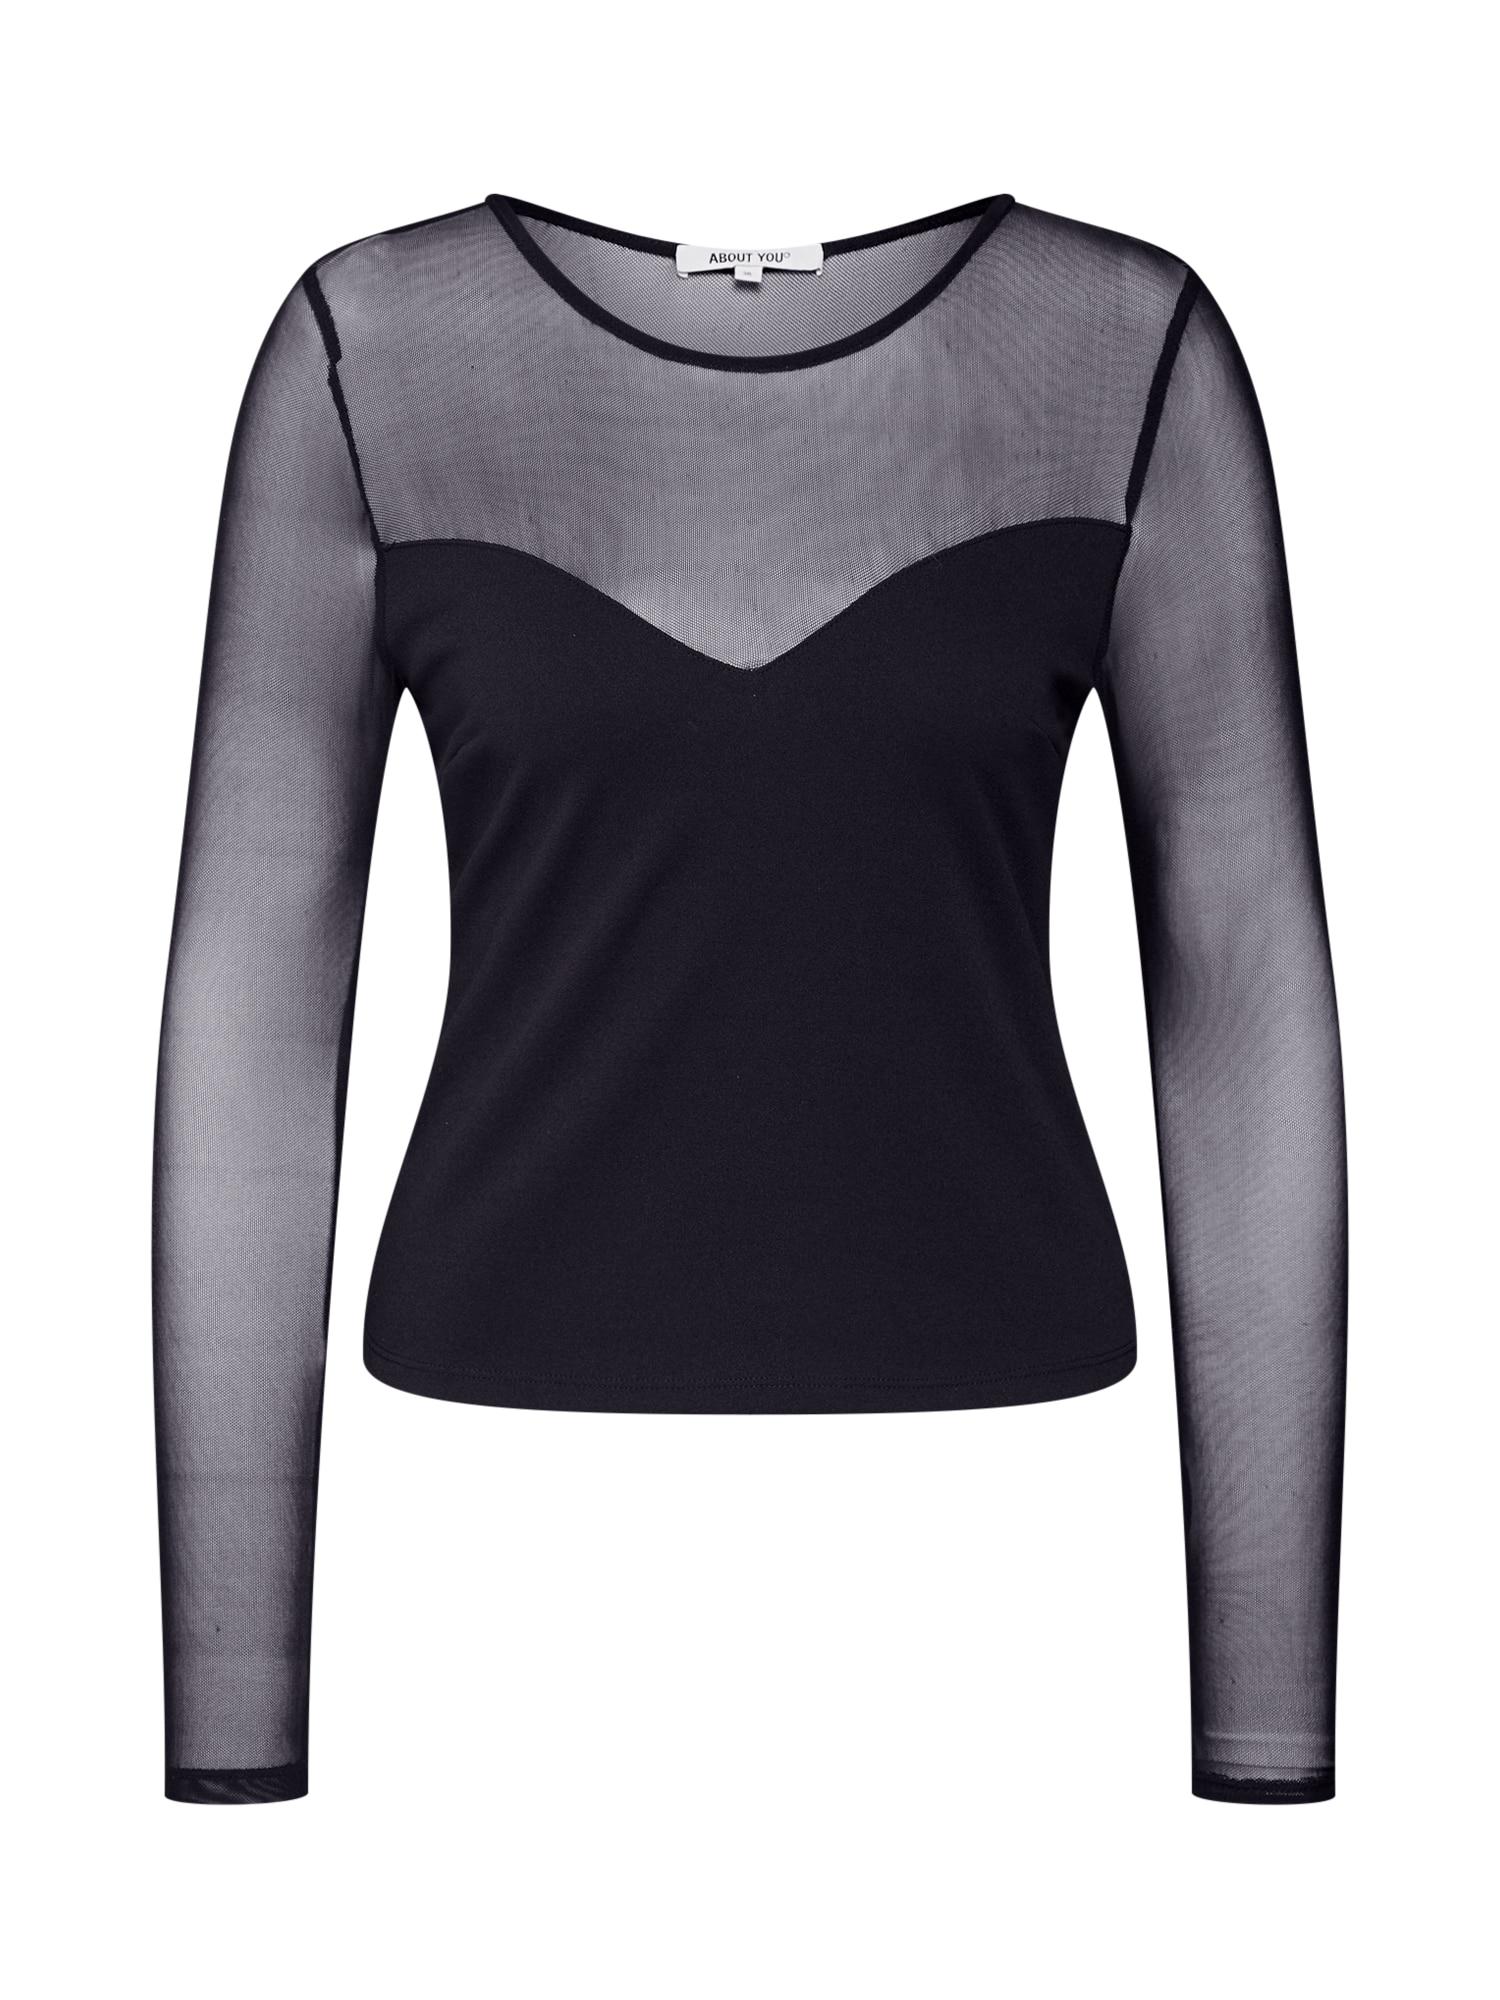 ABOUT YOU Marškinėliai 'Evelyn' juoda